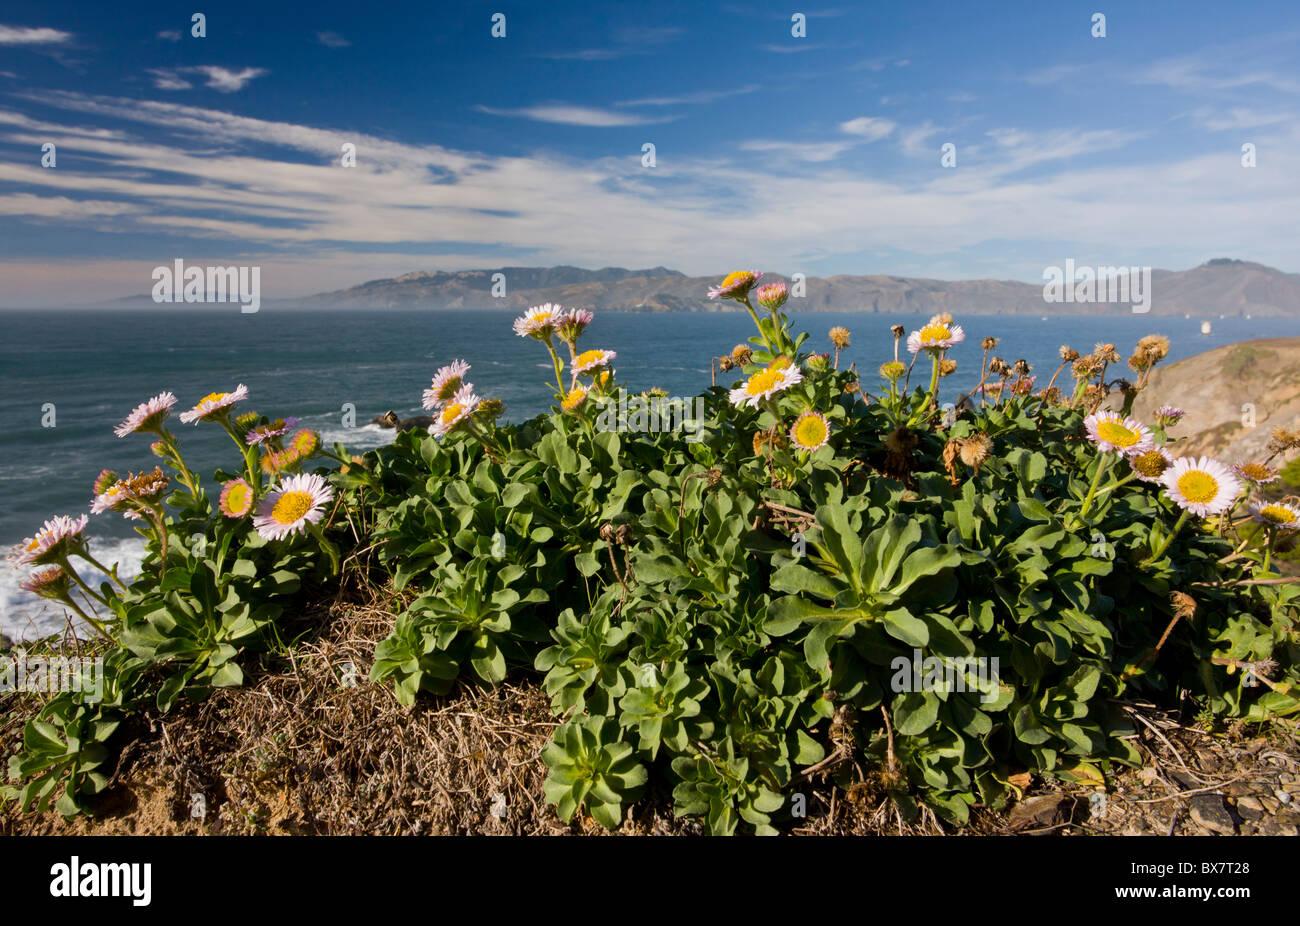 Seaside fleabane, Beach aster, or Seaside daisy Erigeron glaucus in native habitat on cliffs, San Francisco Bay, California. Stock Photo